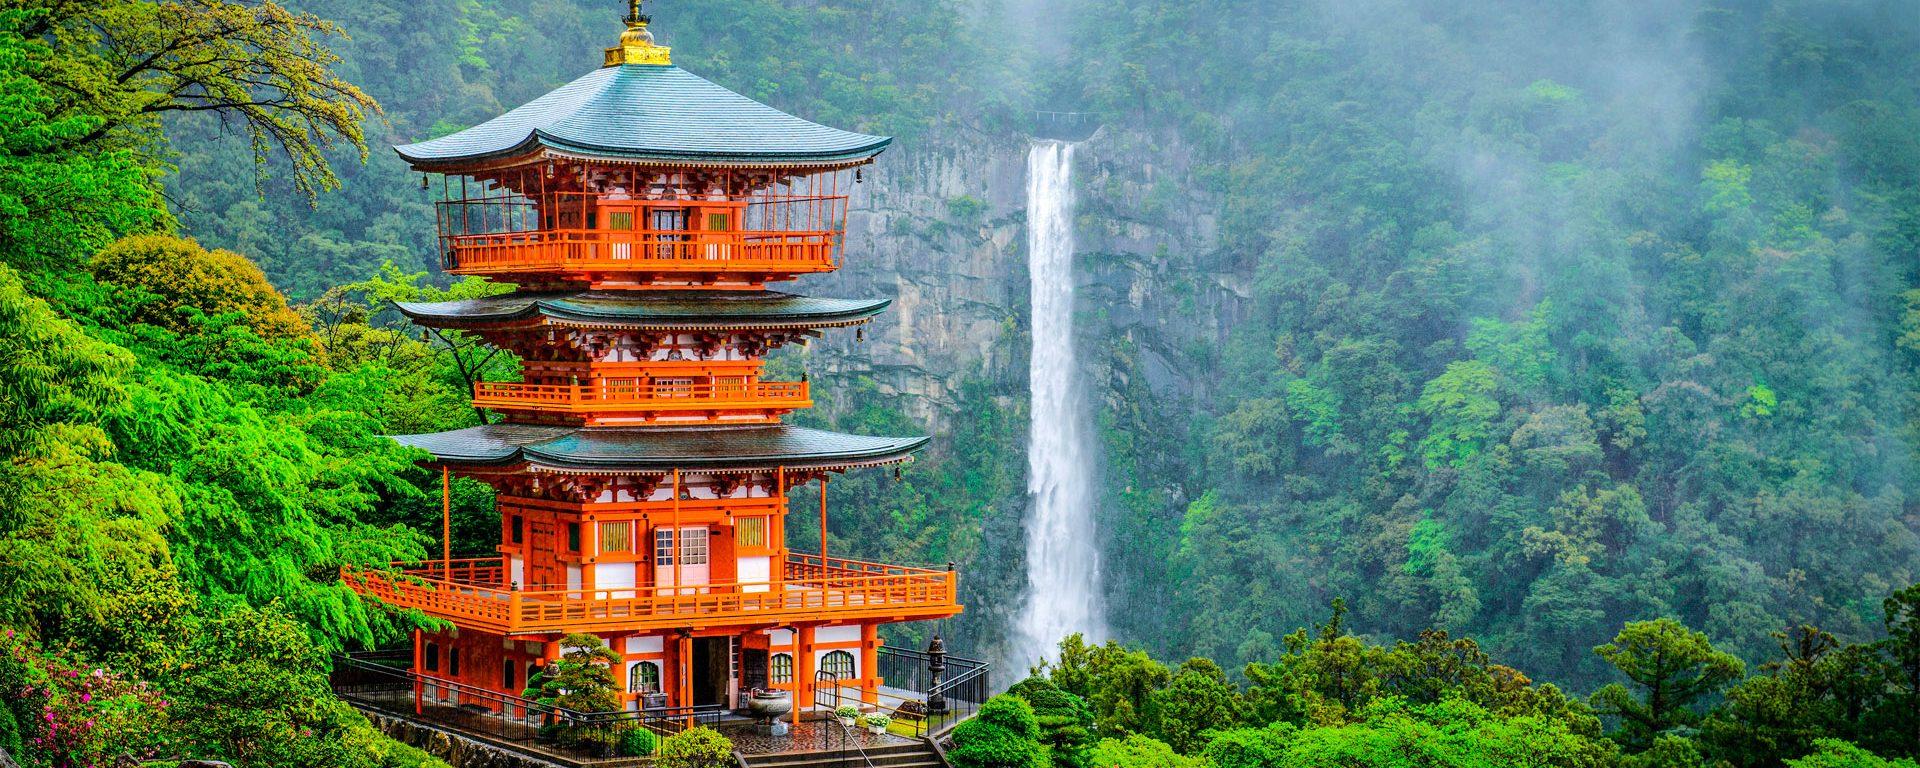 Kumano Nachi Taisha shrine stands in front of waterfall on Mount Nachi, Japan